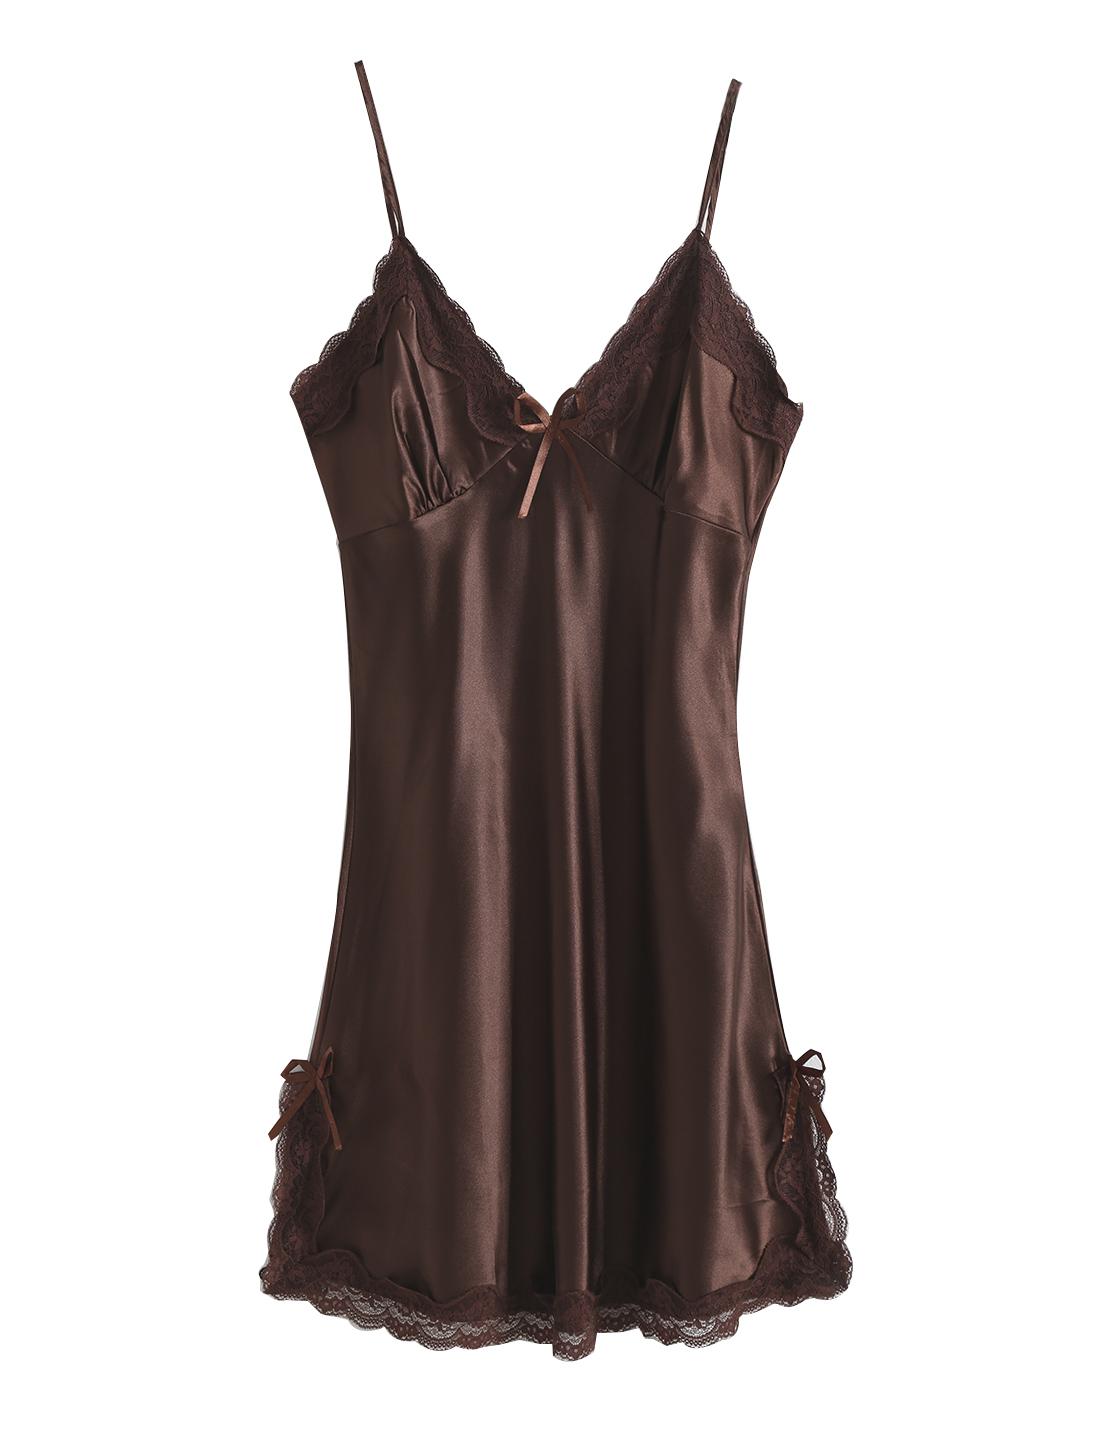 Women Satin Lace Trim Sleepwear Nightgown Pajama Slip Dress Coffee-Lace M